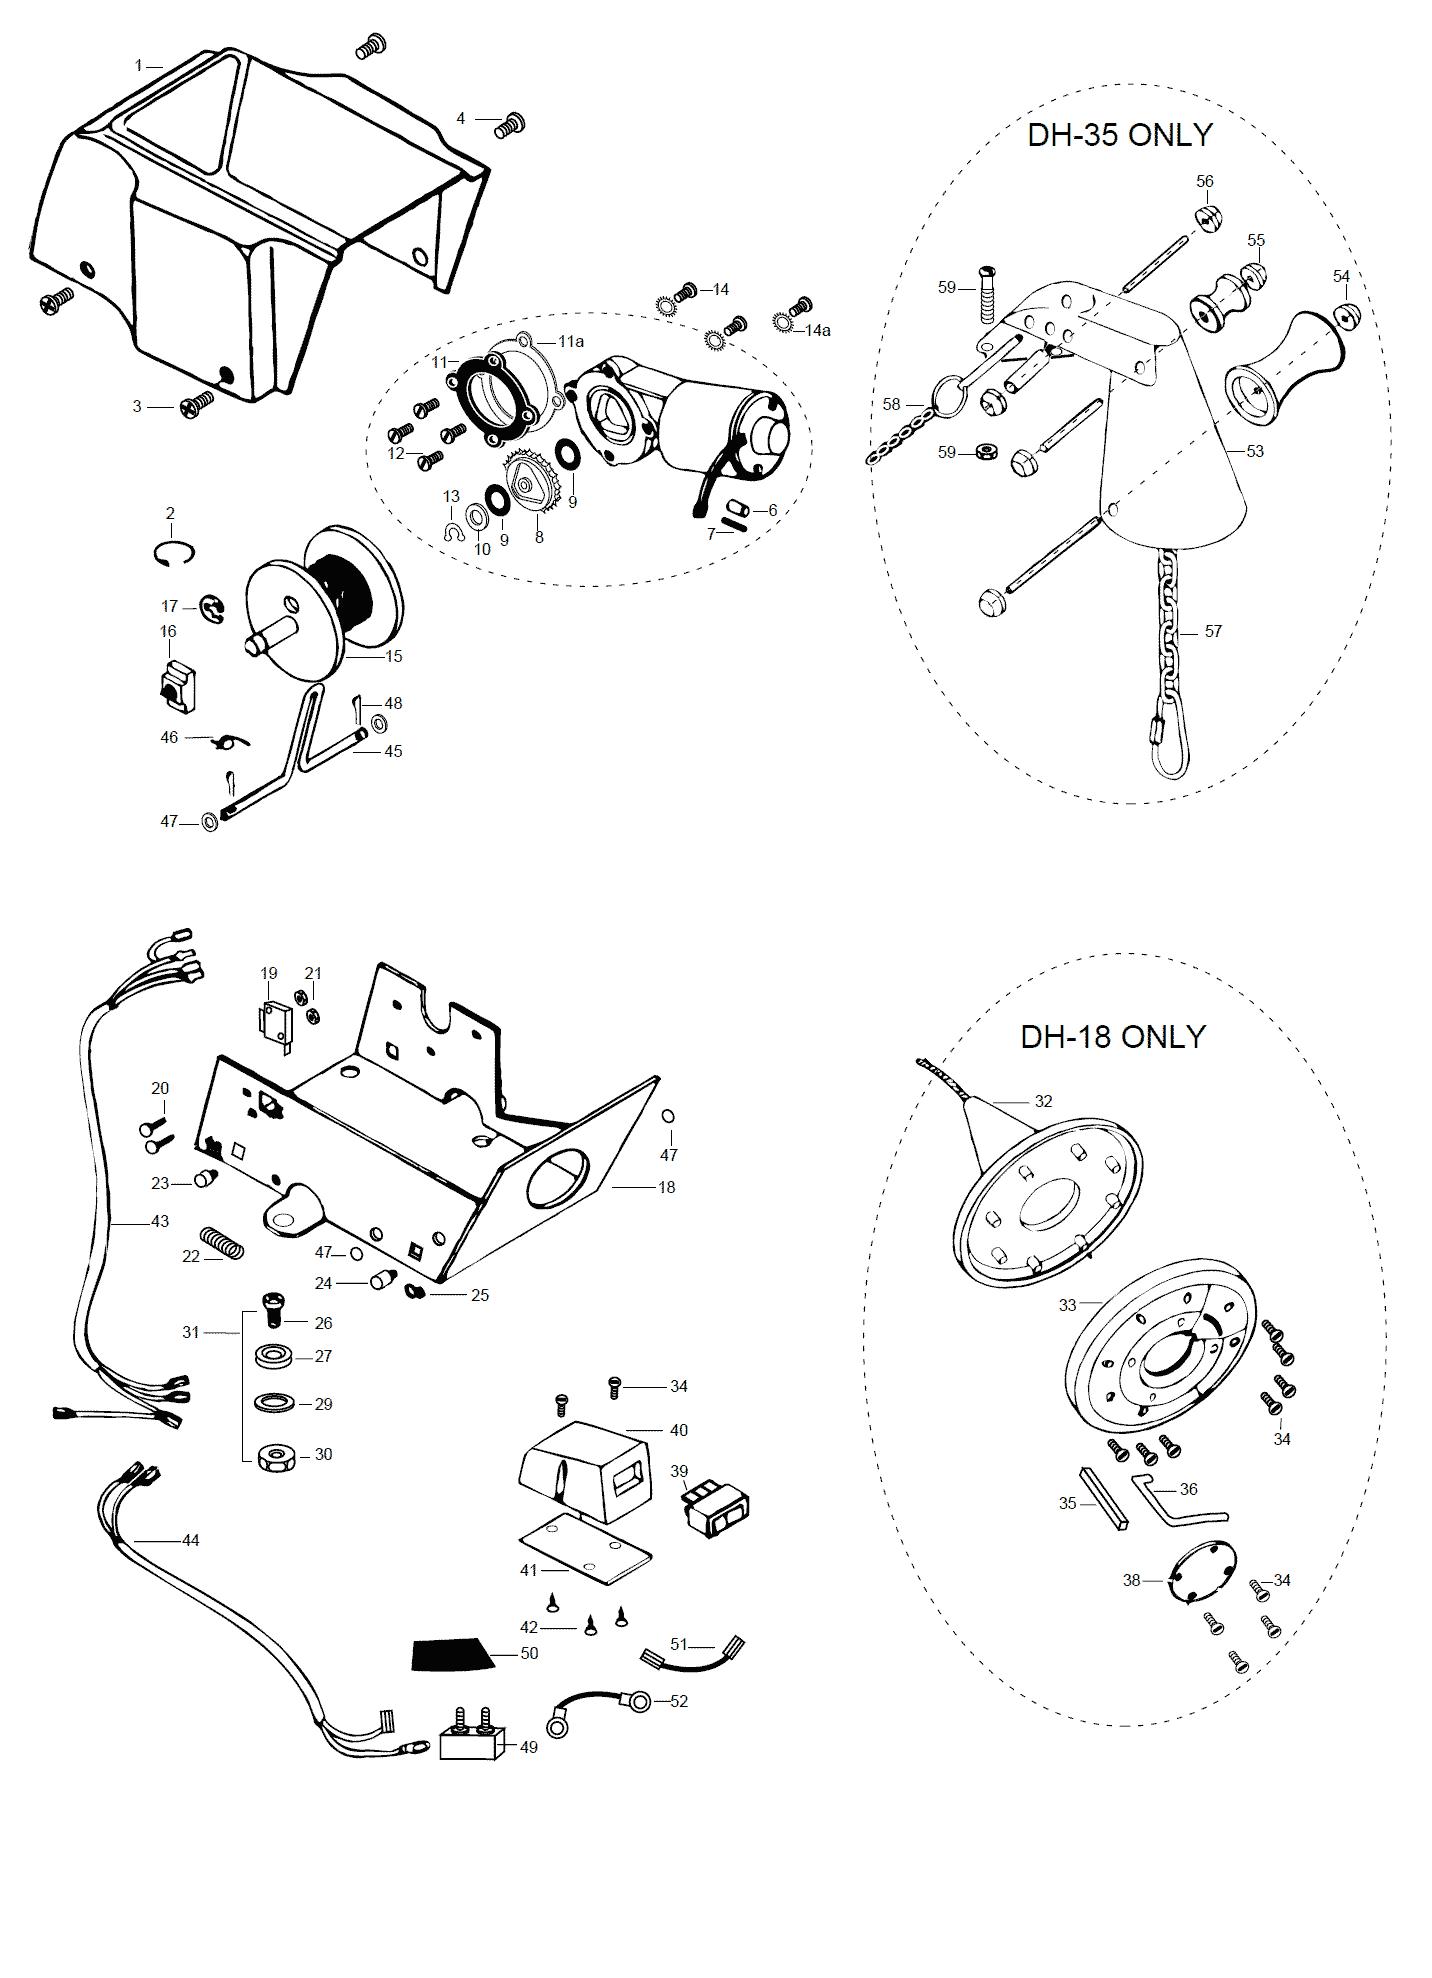 wiring diagram for minn kota dh 40